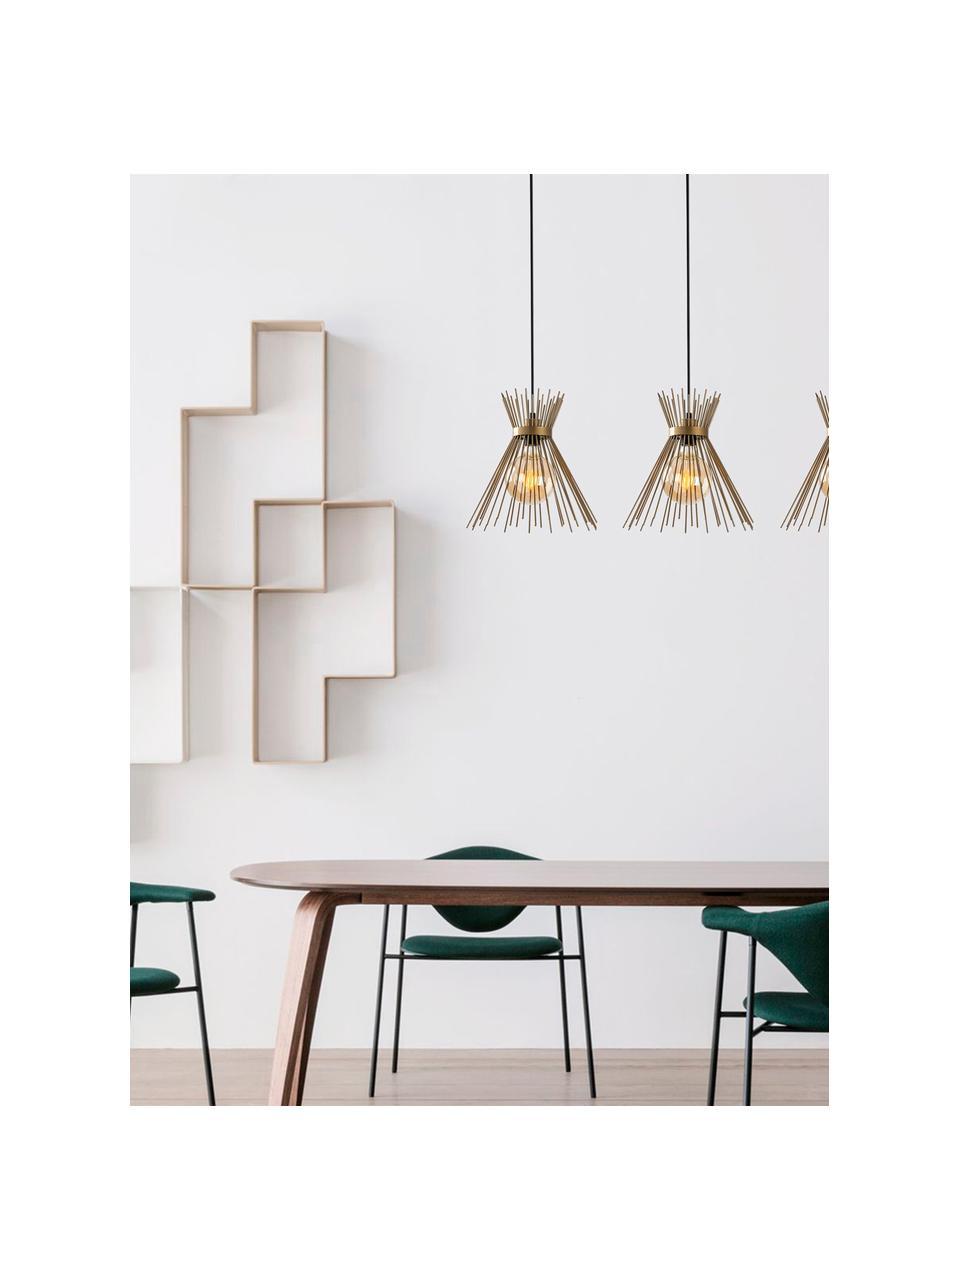 Große Design Pendelleuchte Kirpi in Messing, Baldachin: Metall, beschichtet, Messingfarben, Schwarz, B 104 x T 30 cm